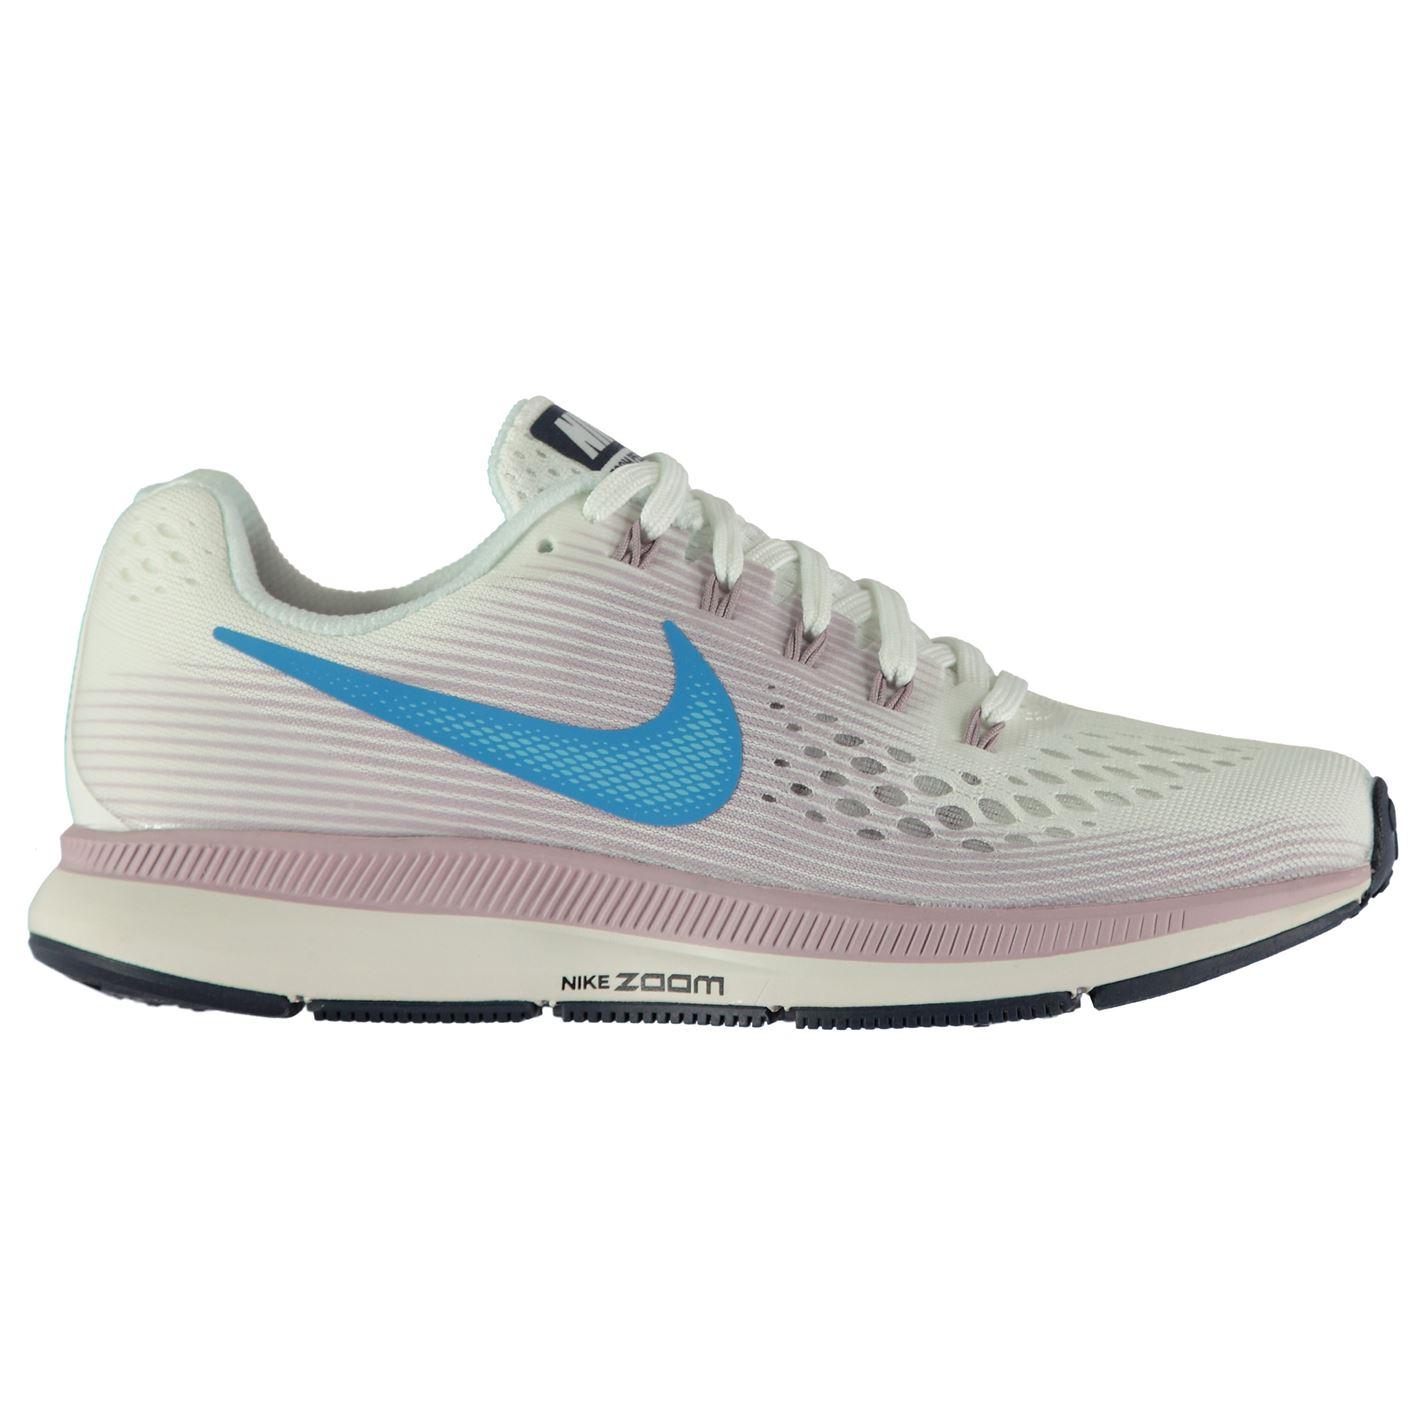 new product 6868c cc1d2 Tenisice za trčanje Nike Air Zoom Pegasus 34 Ladies Running Shoes Bijela -  Jeftinije.hr